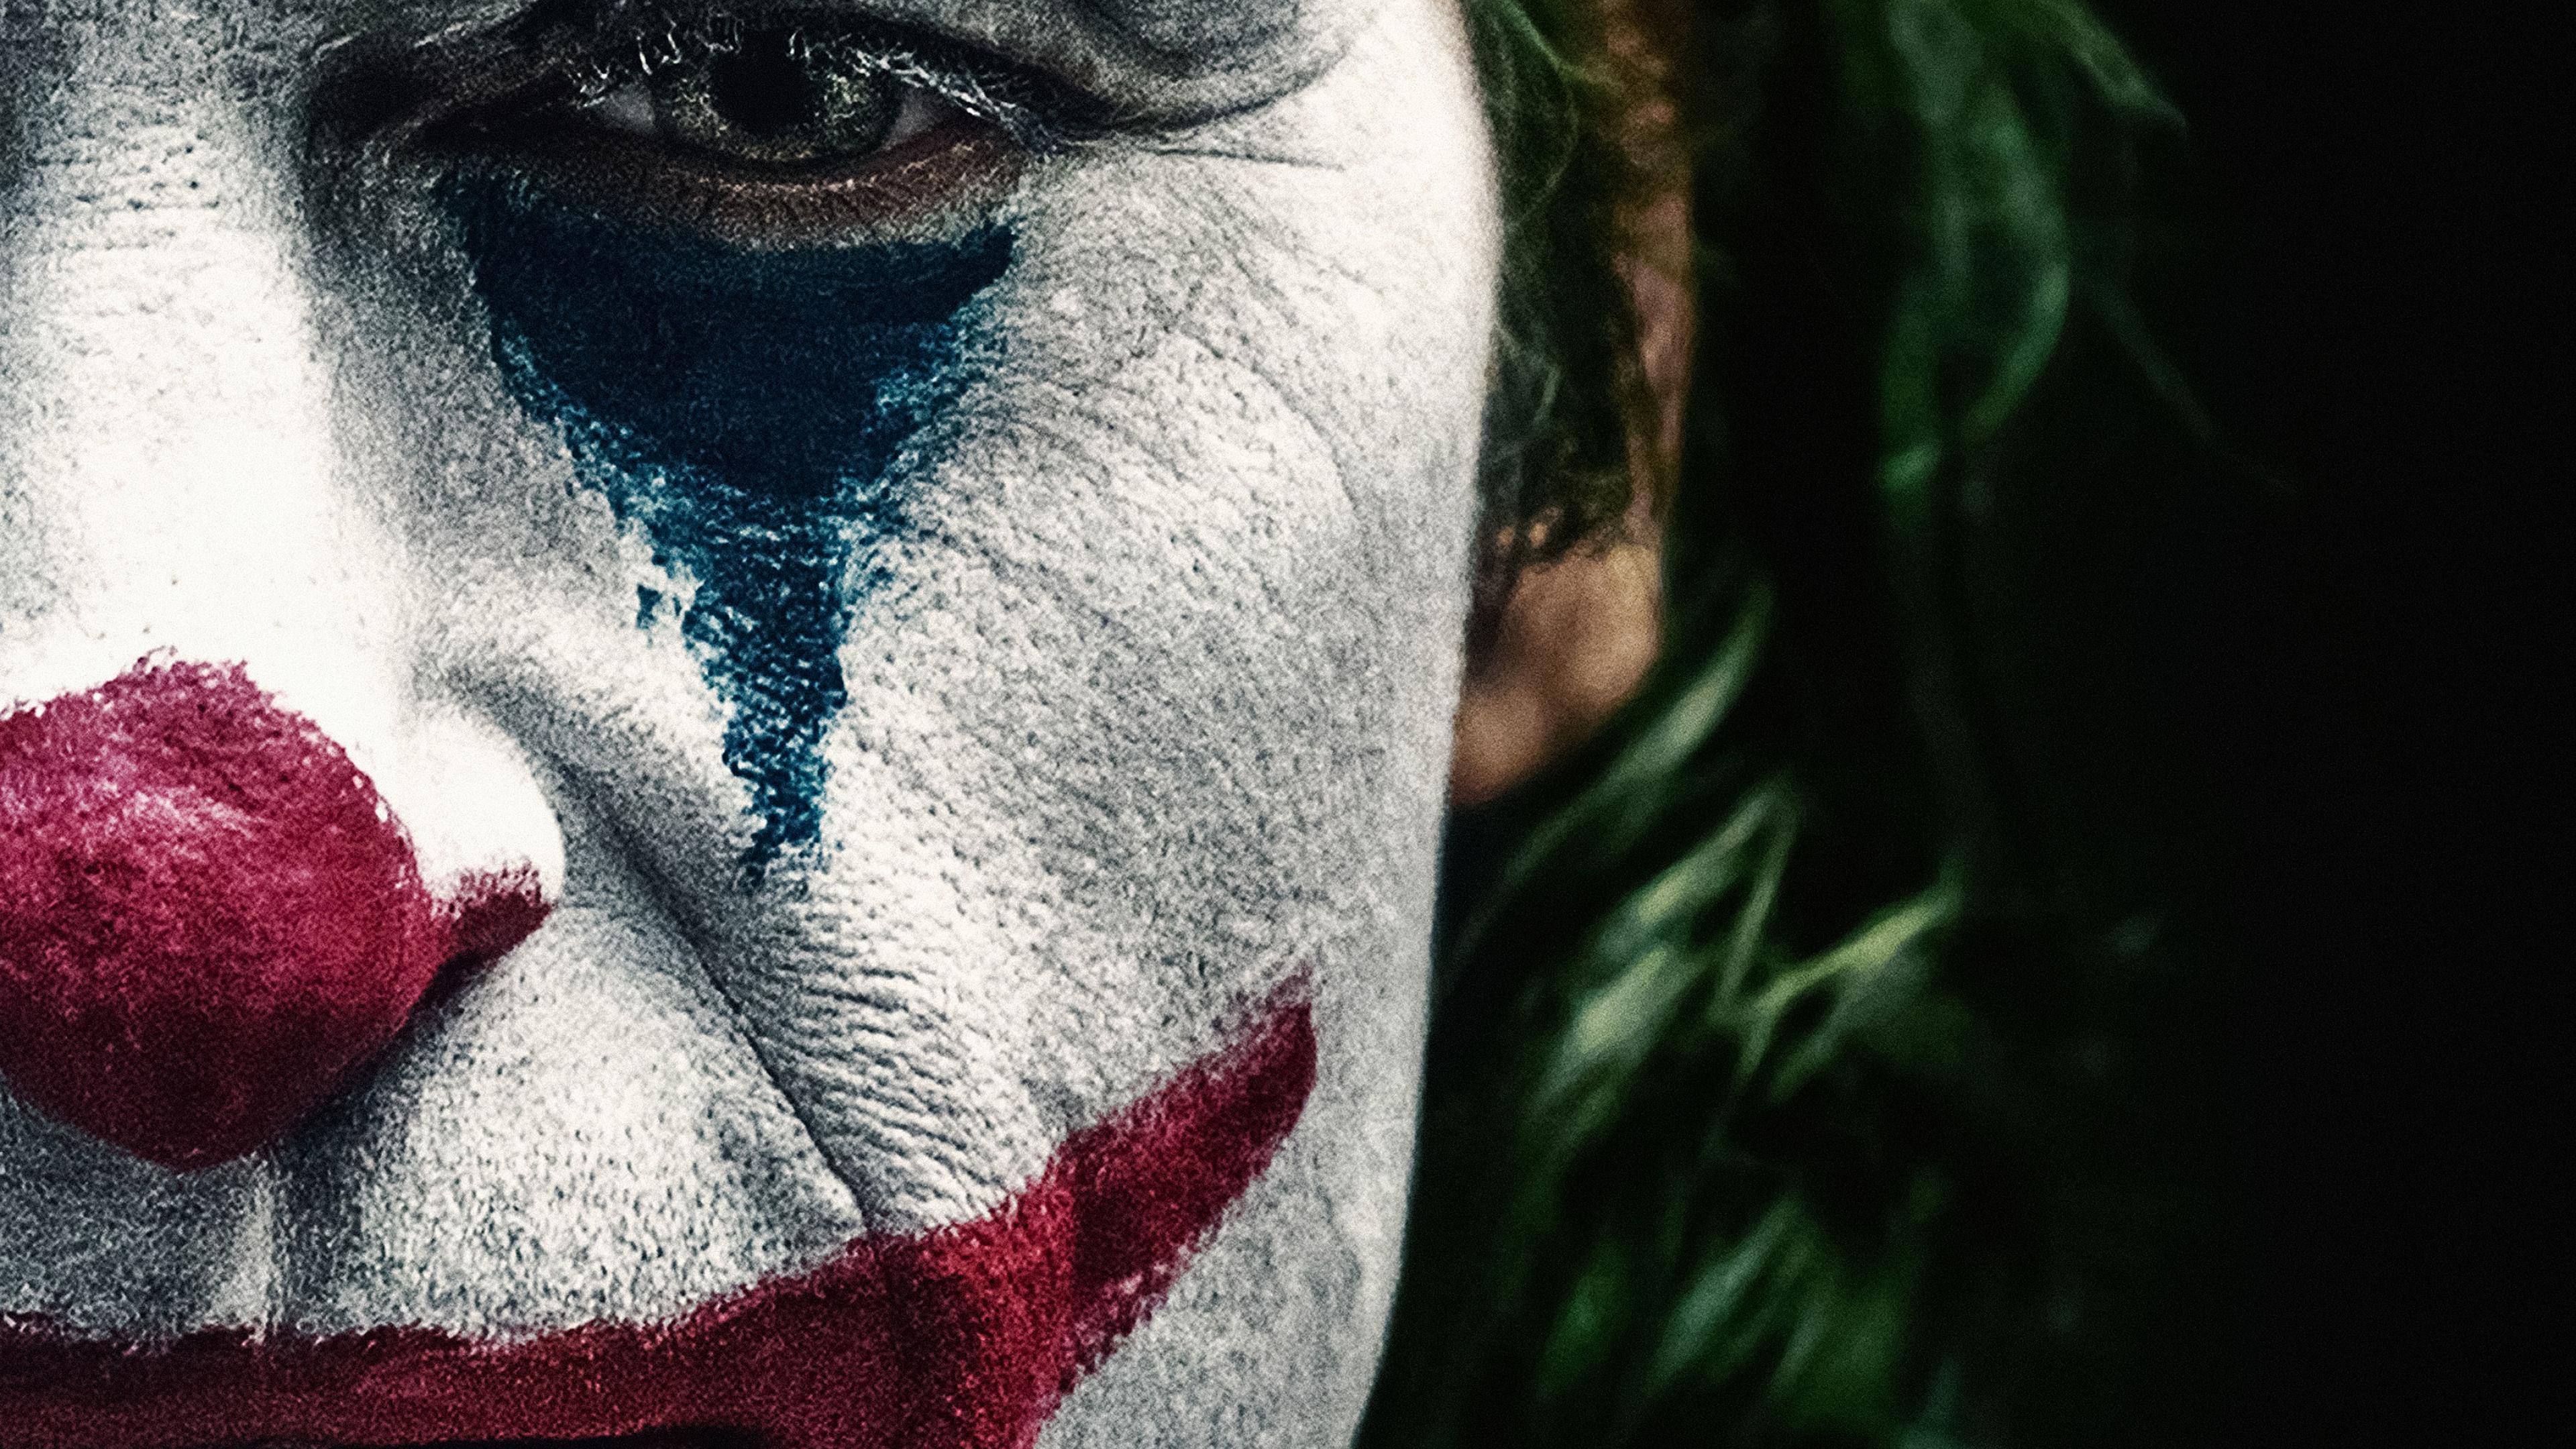 3840x2160 Joker 2019 4K Wallpaper, HD Movies 4K Wallpapers ...